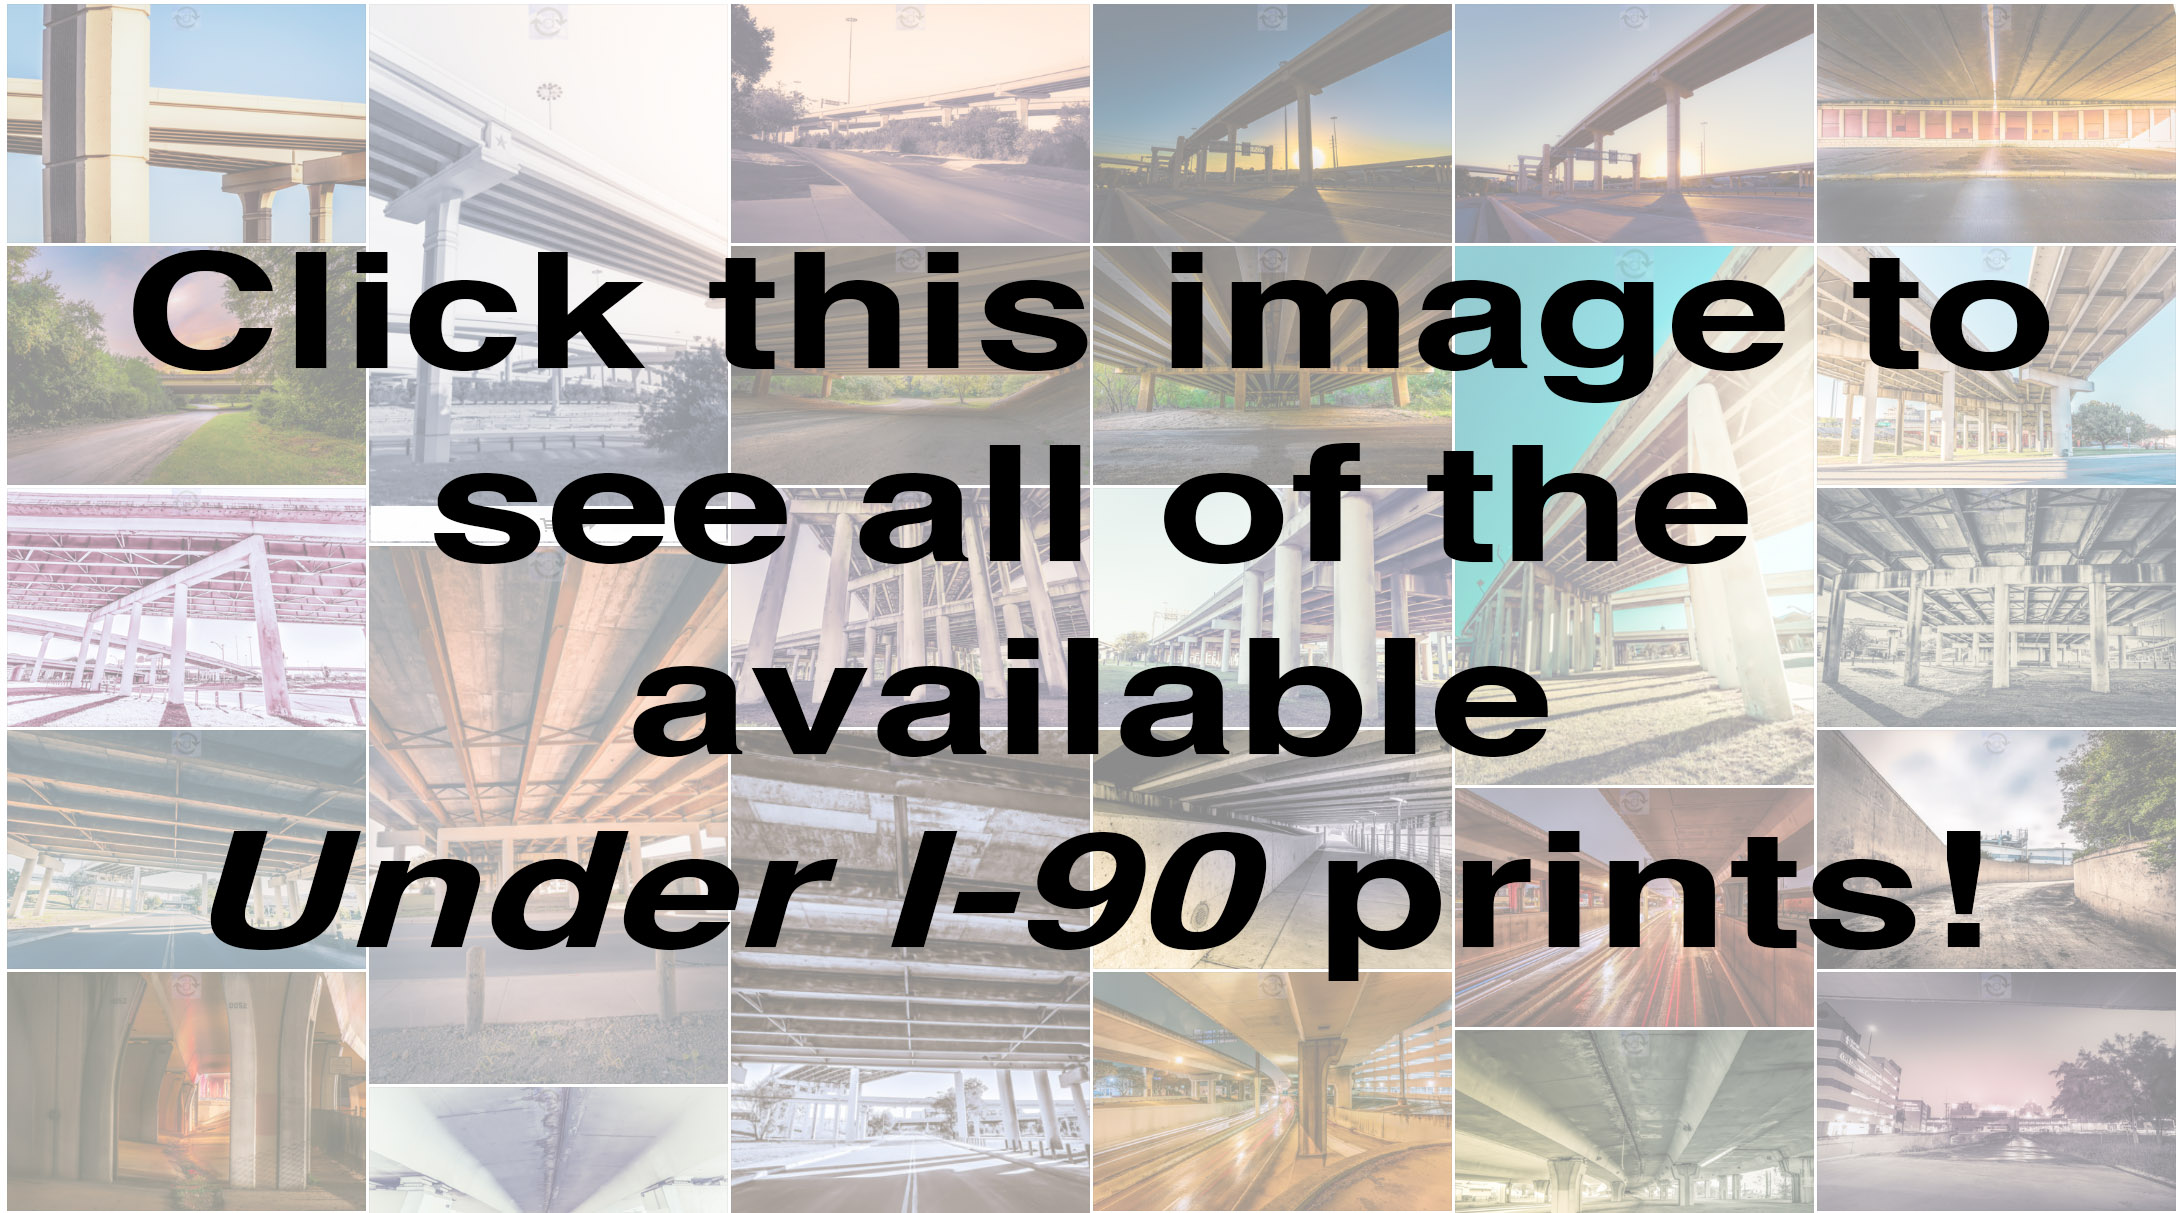 U I90 prints.jpg